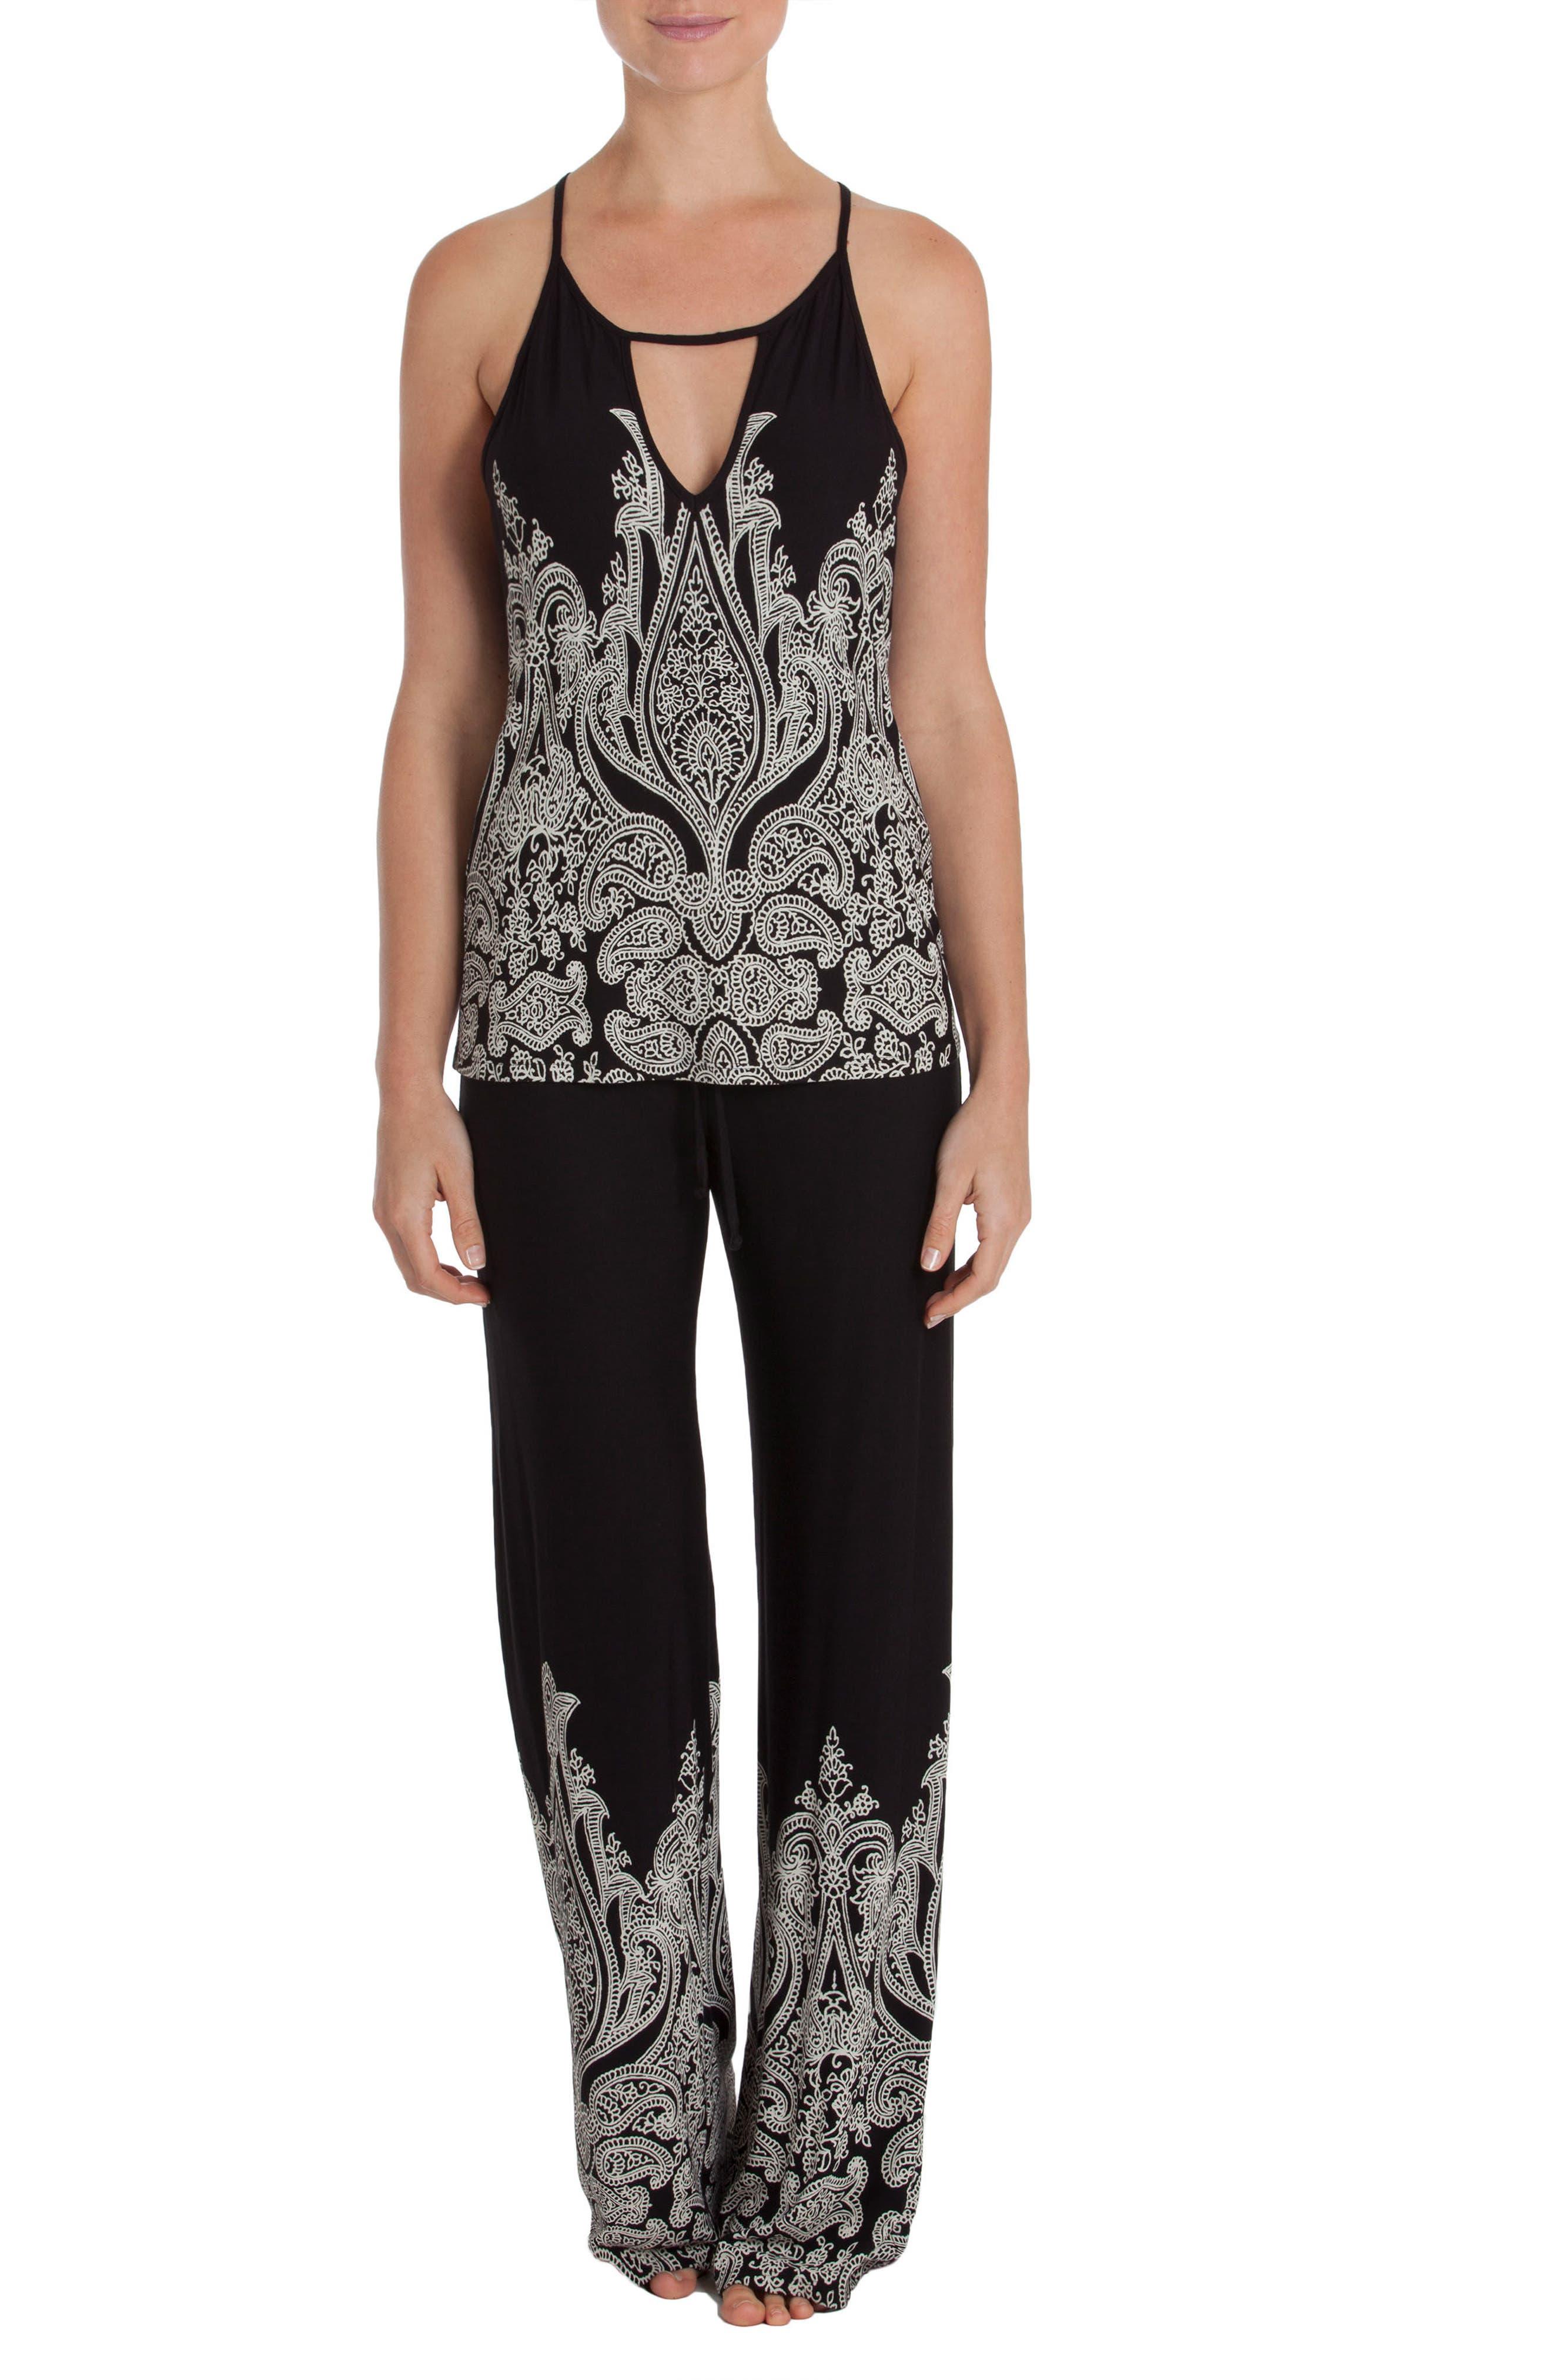 Camisole Pajamas,                         Main,                         color, Black/ Ivory Print